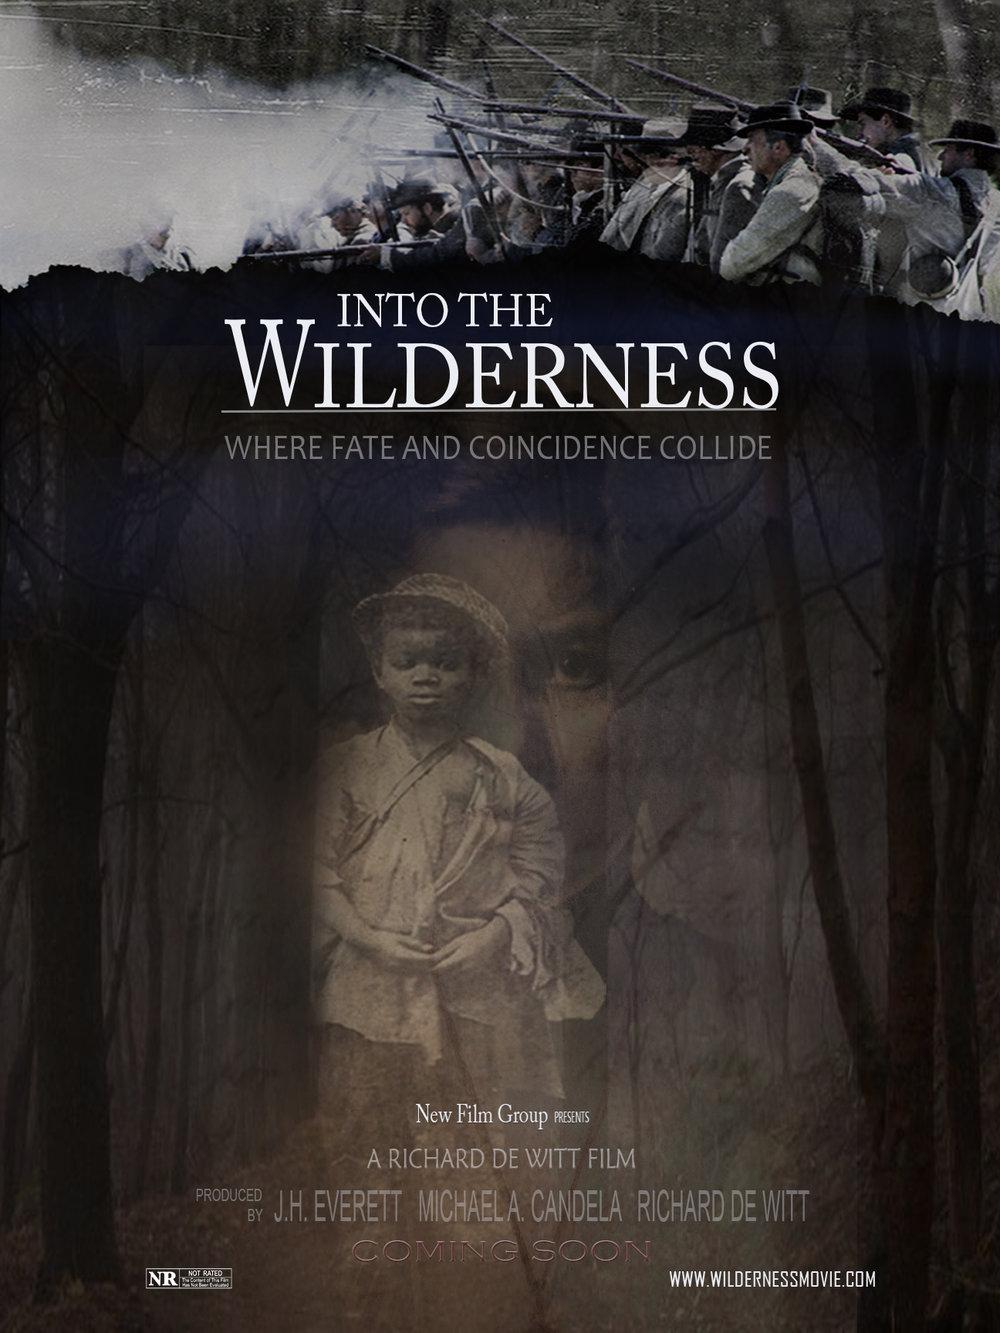 wilderness-poster-card-nfg-05292018-m003.jpg